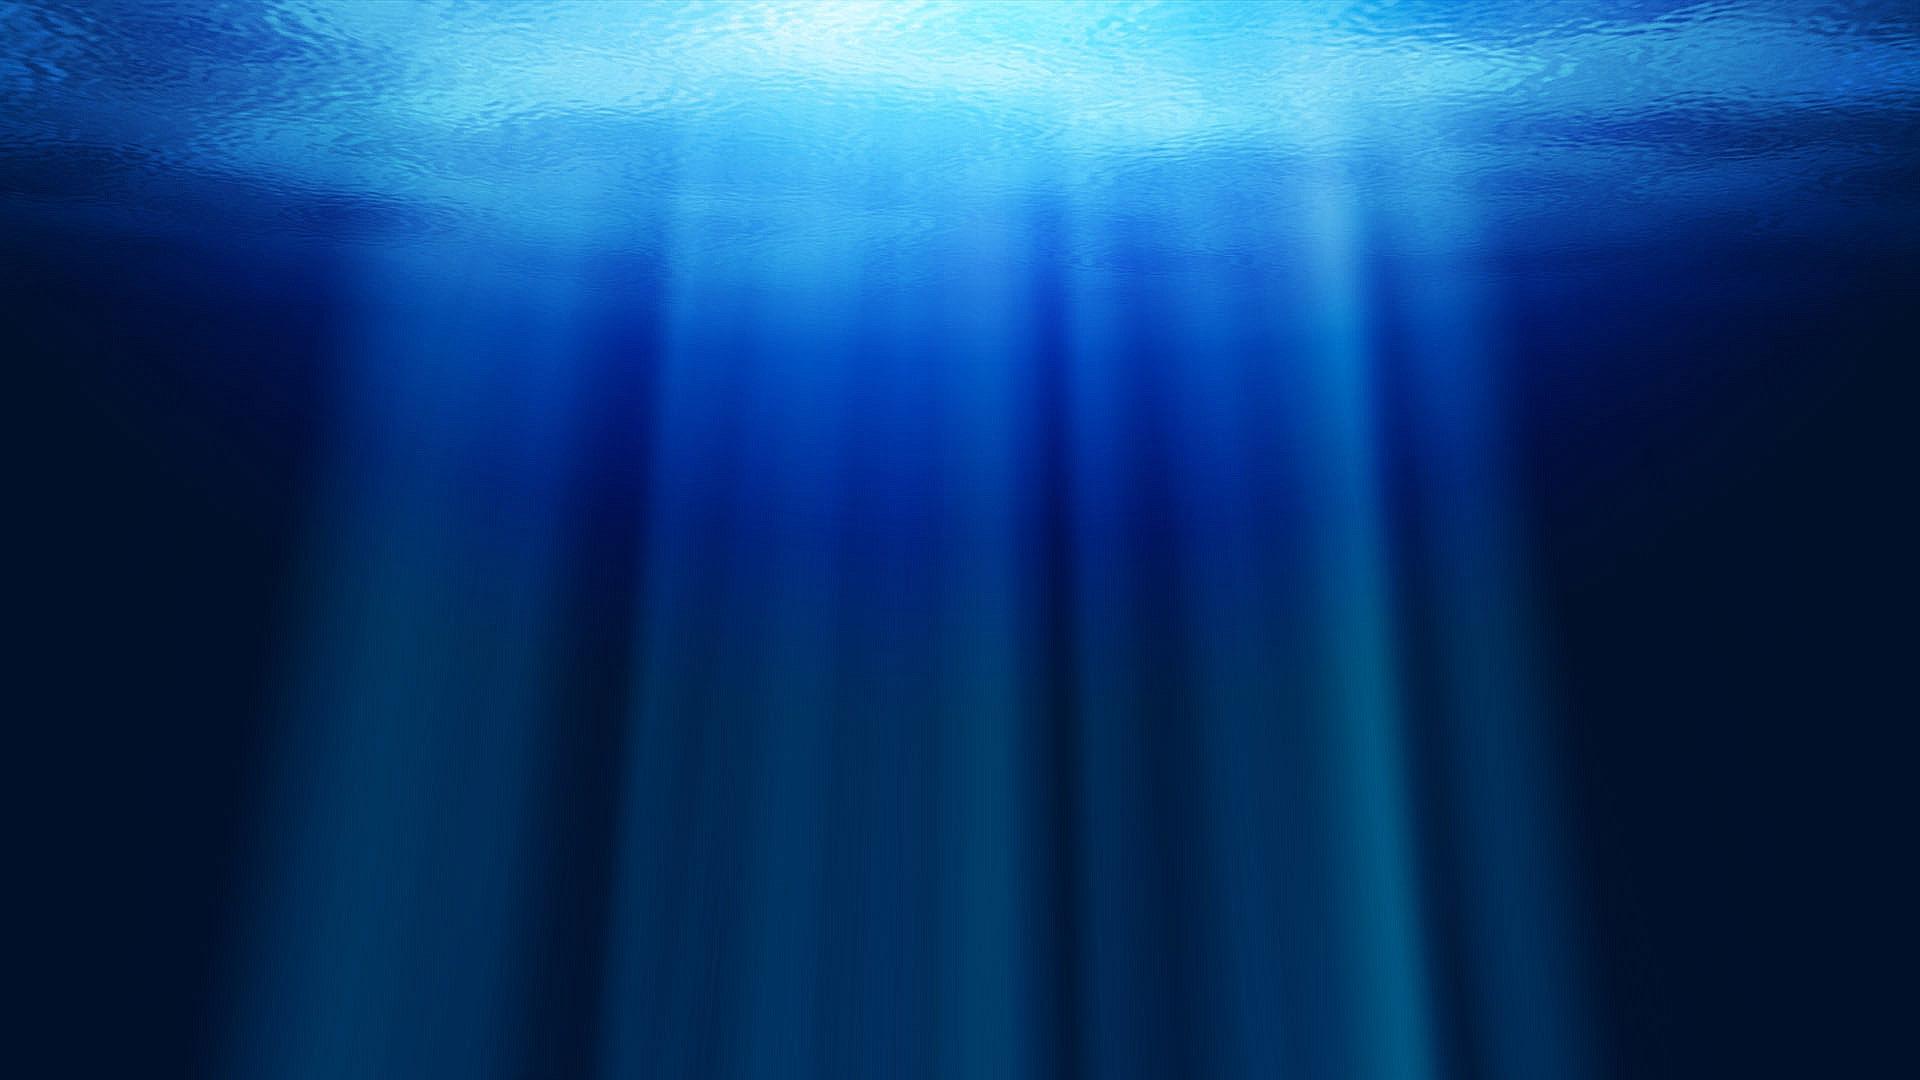 ocean water rays depth 1920x1080